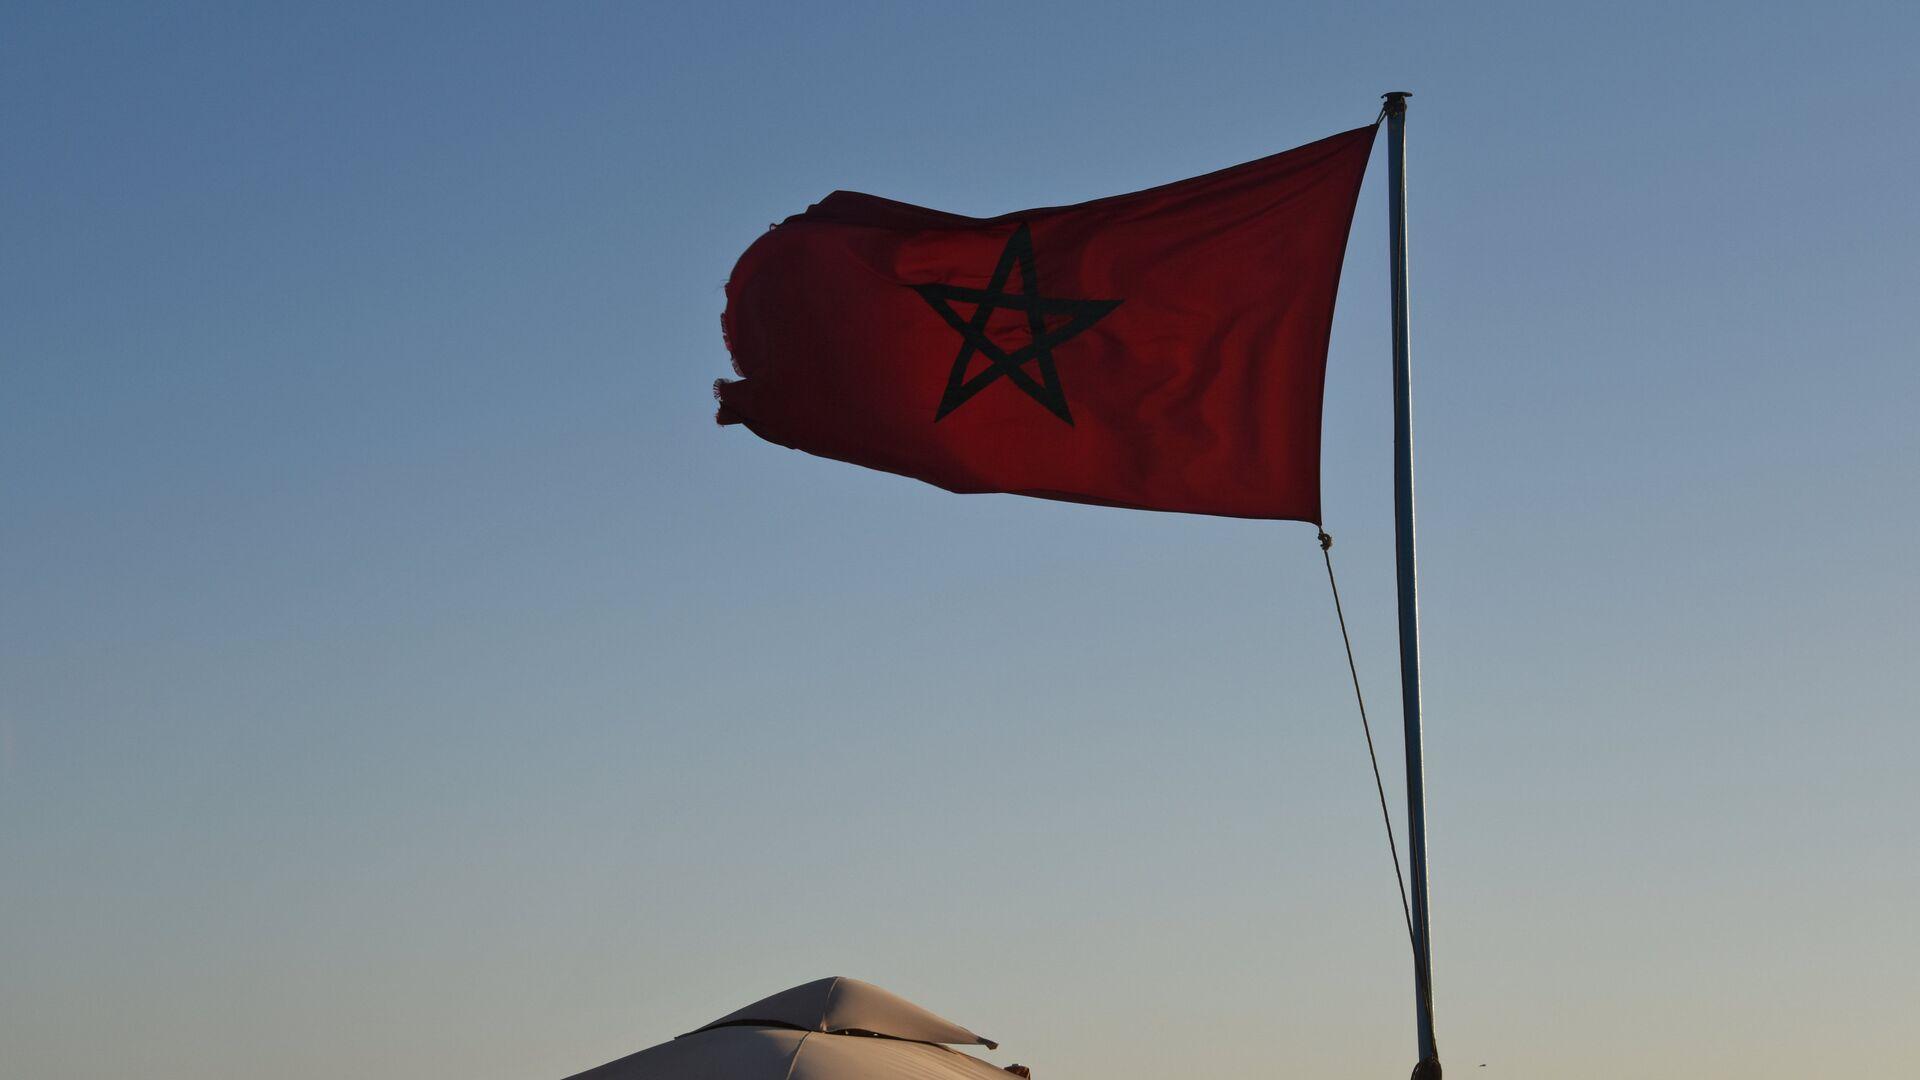 Couleur nationale du Maroc - Sputnik Italia, 1920, 10.09.2021